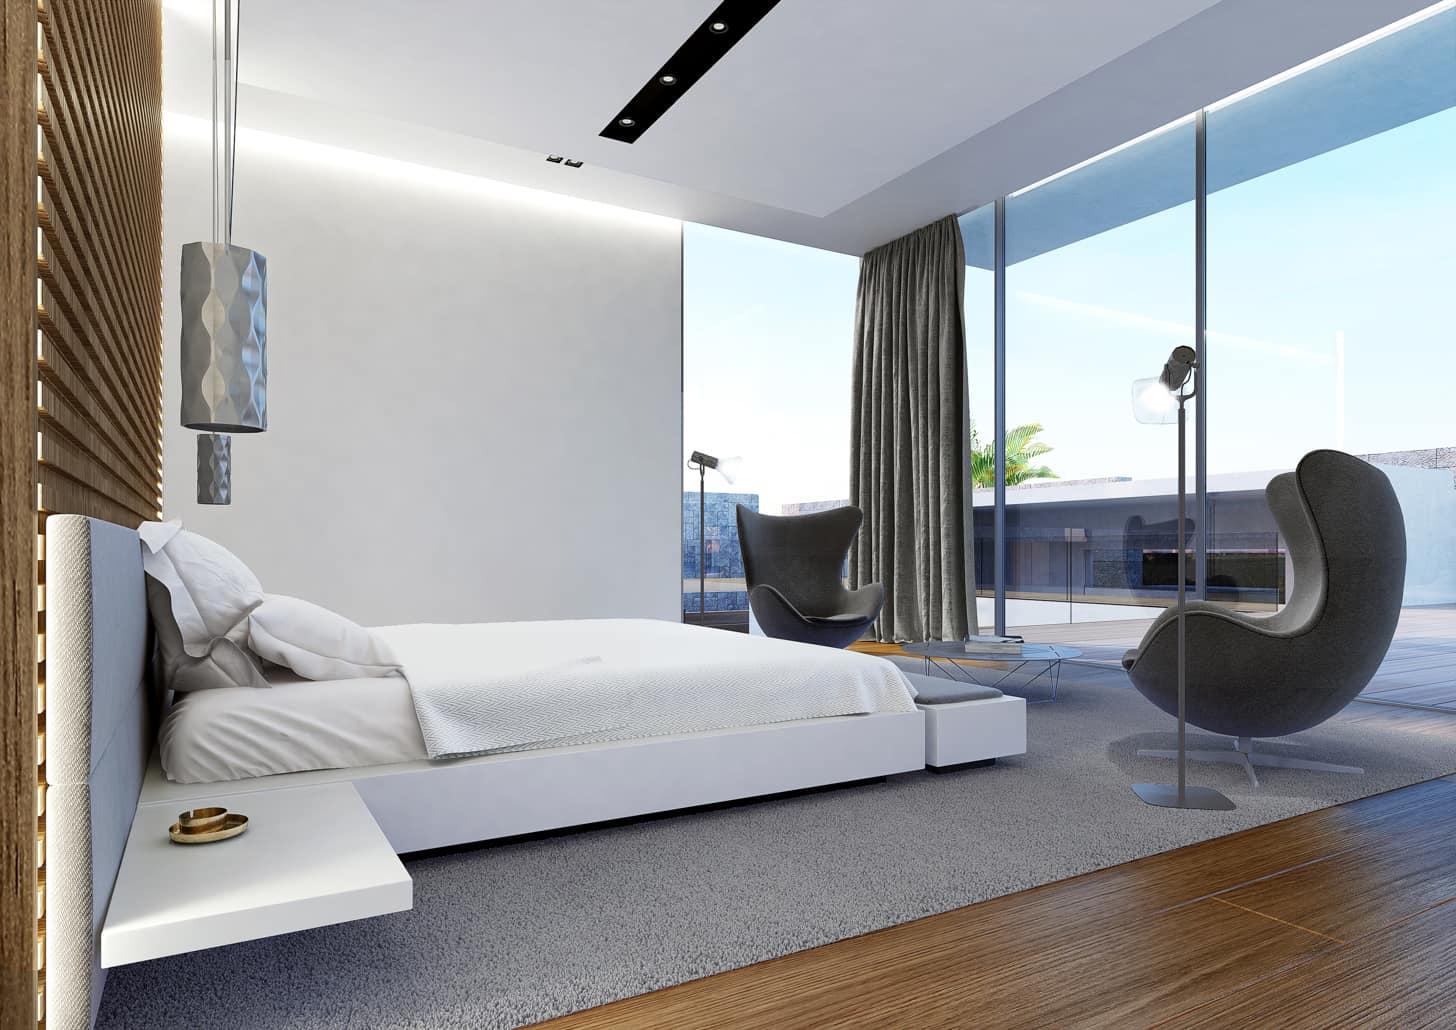 les demeures bedroom